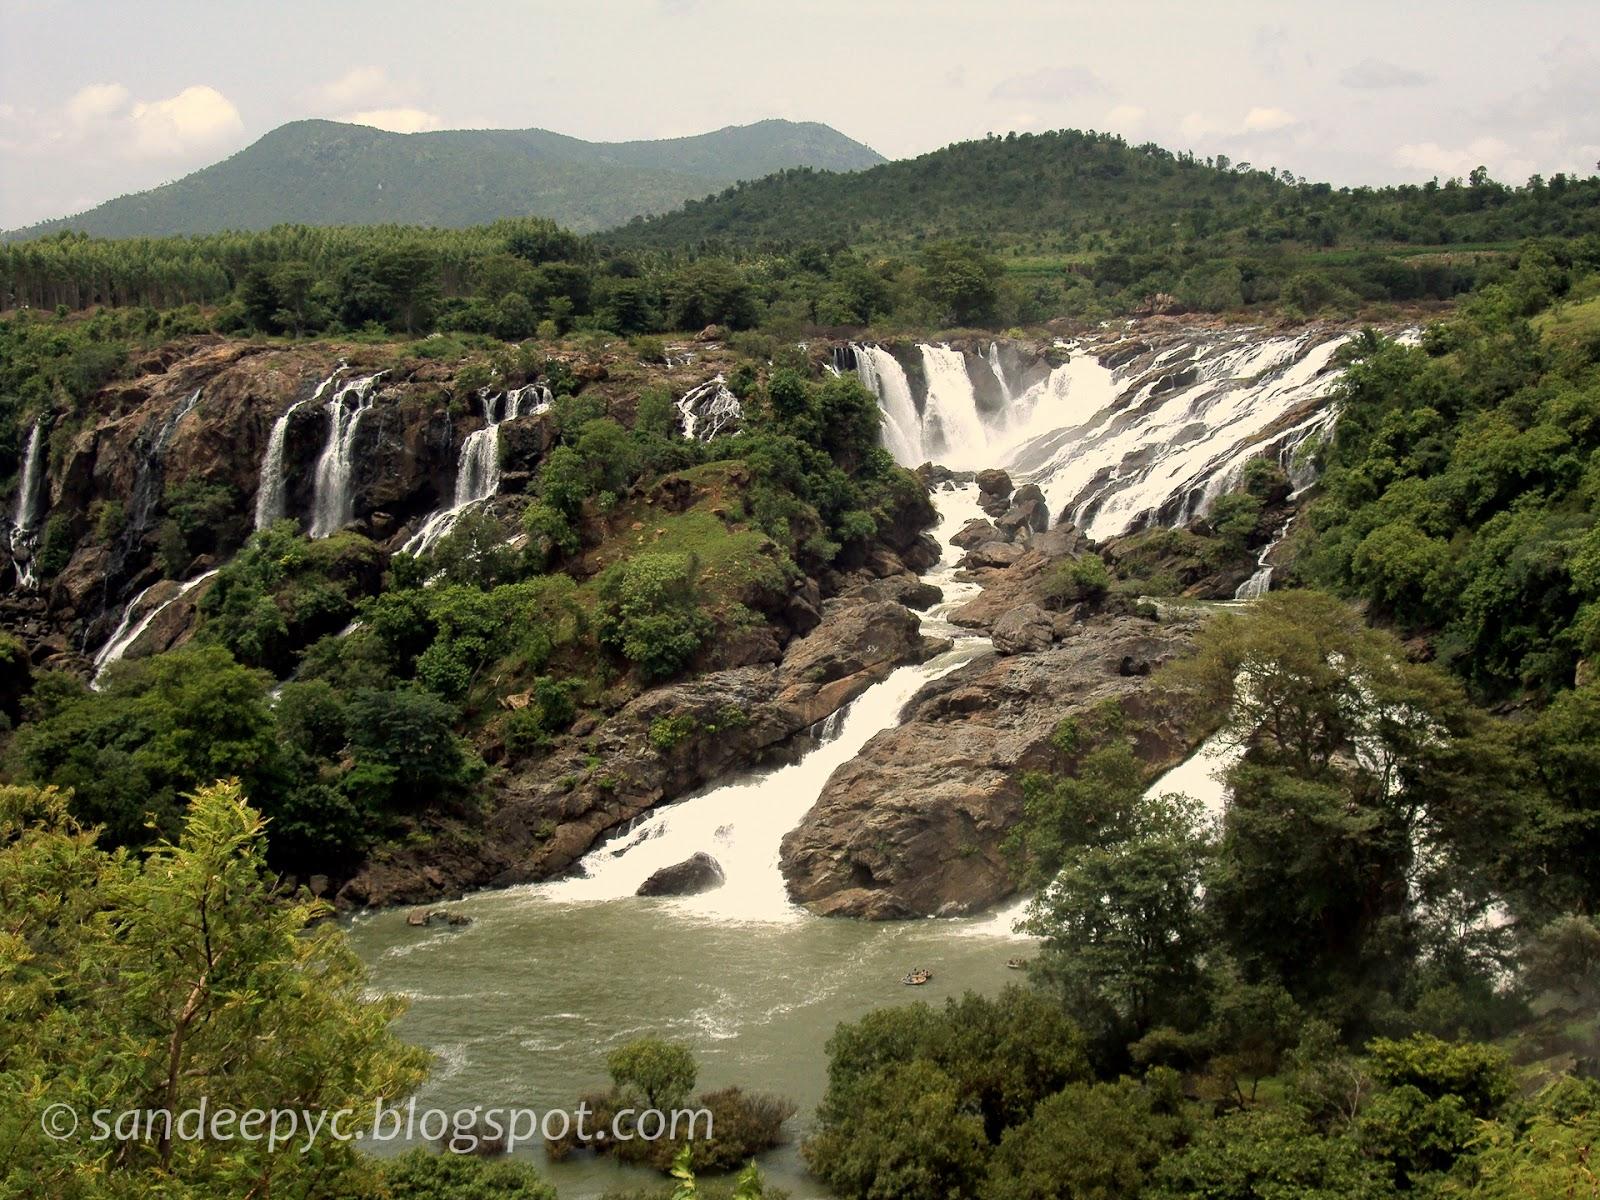 Bharachukki falls part 2